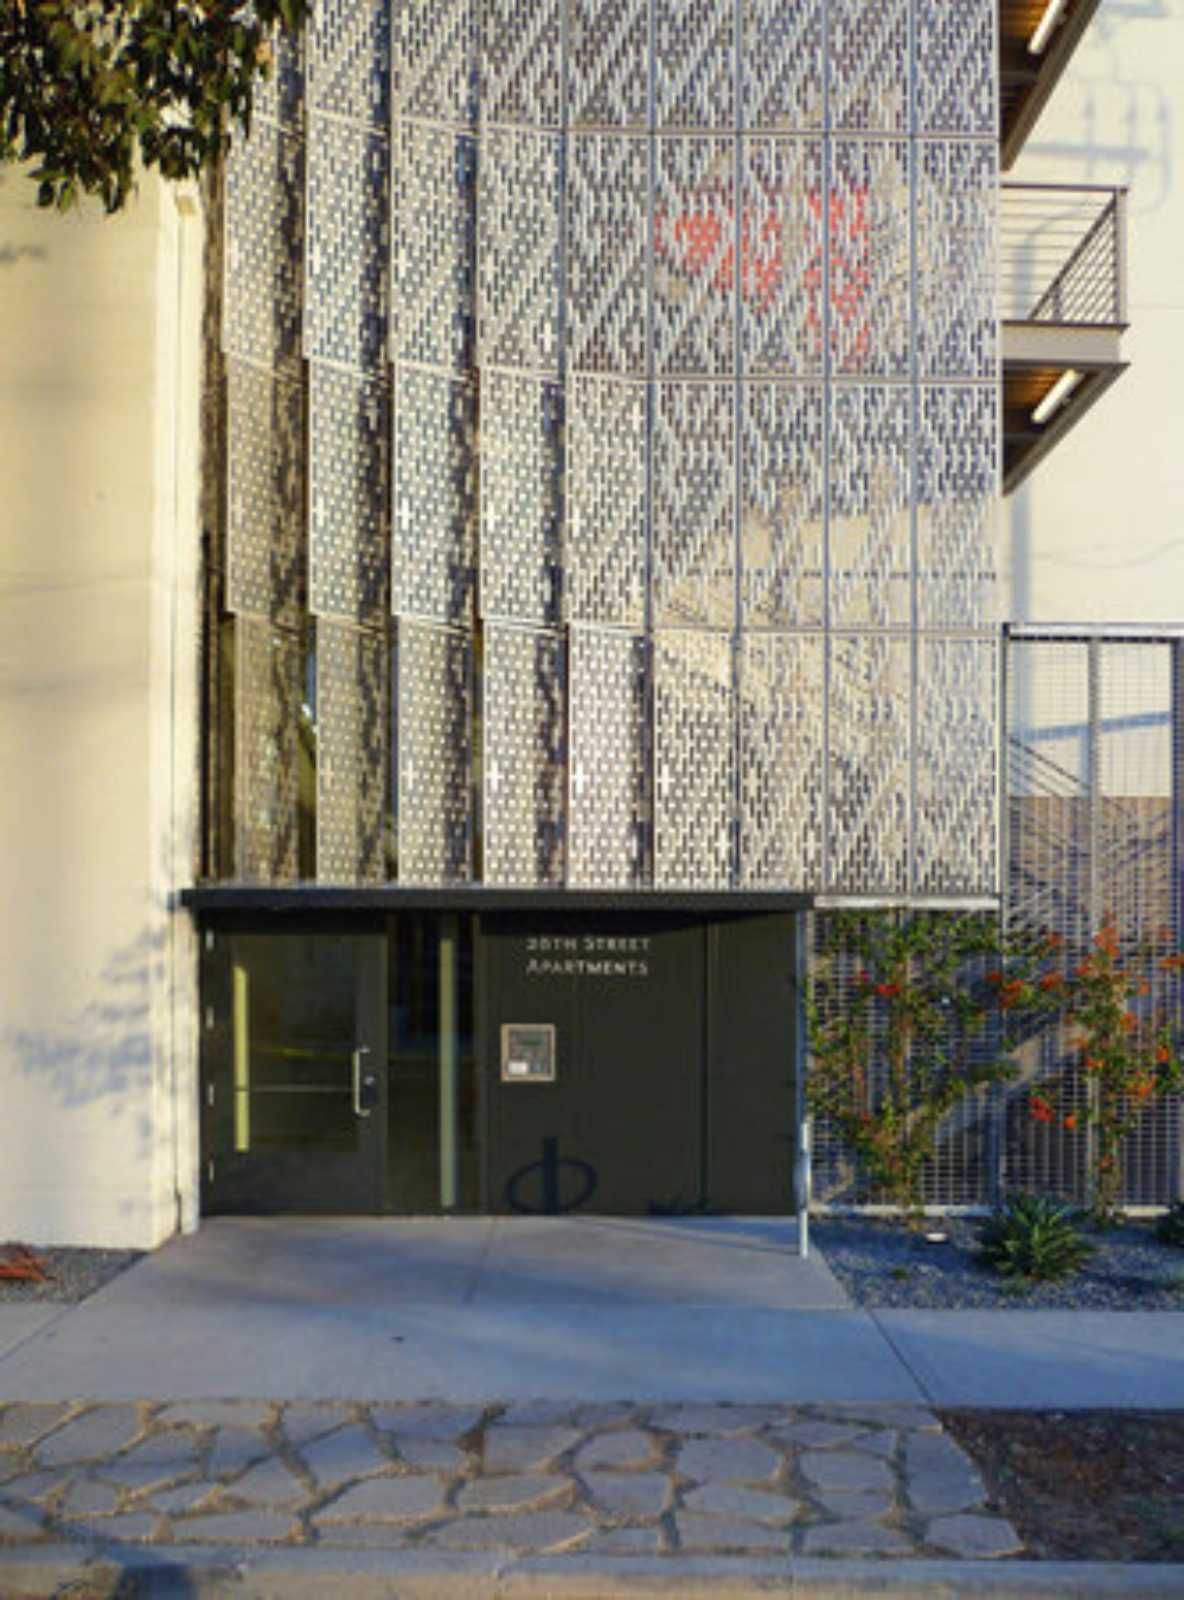 09 28th Street Apartments By Koning Eizenberg